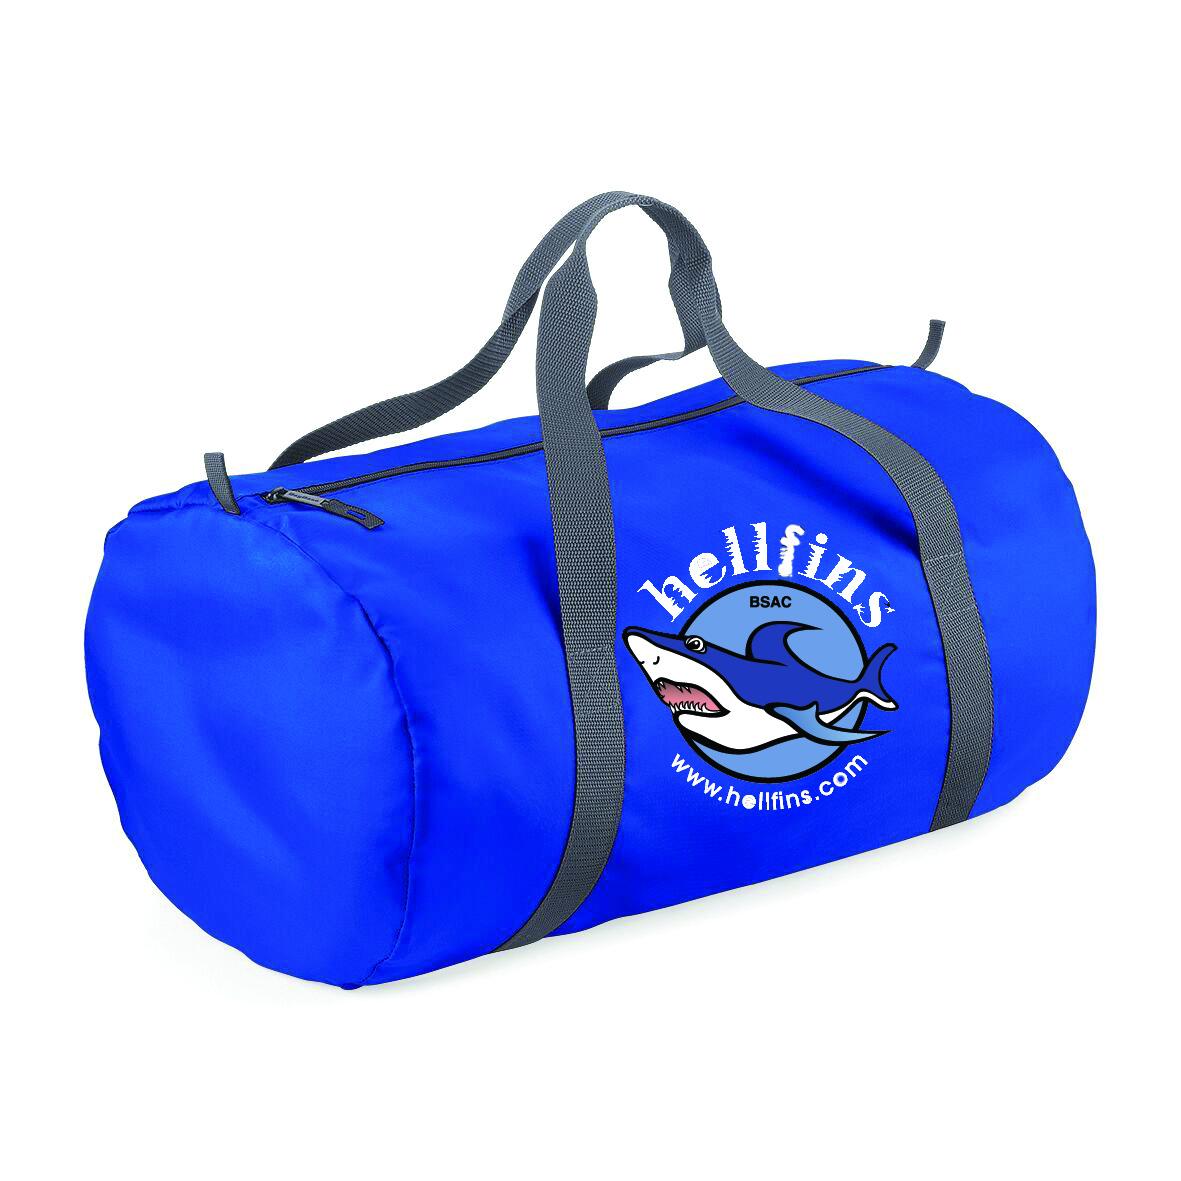 Hellfins Tube Bag